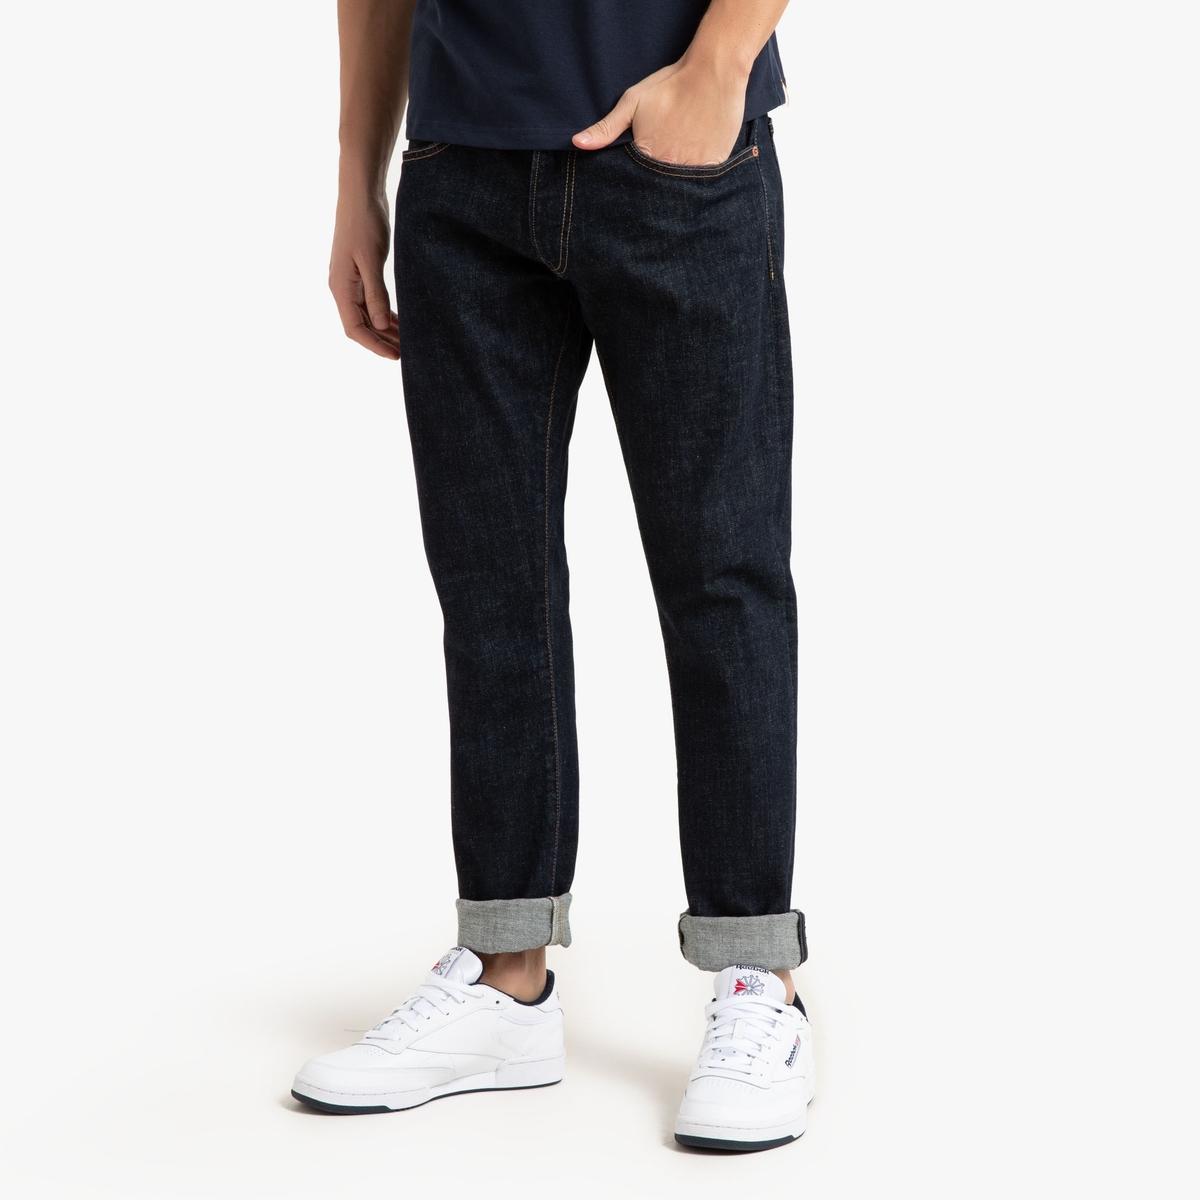 Джинсы La Redoute Узкого покроя стрейч Sullivan 31/34 синий джинсы la redoute стретч узкого покроя hatch 32 34 синий